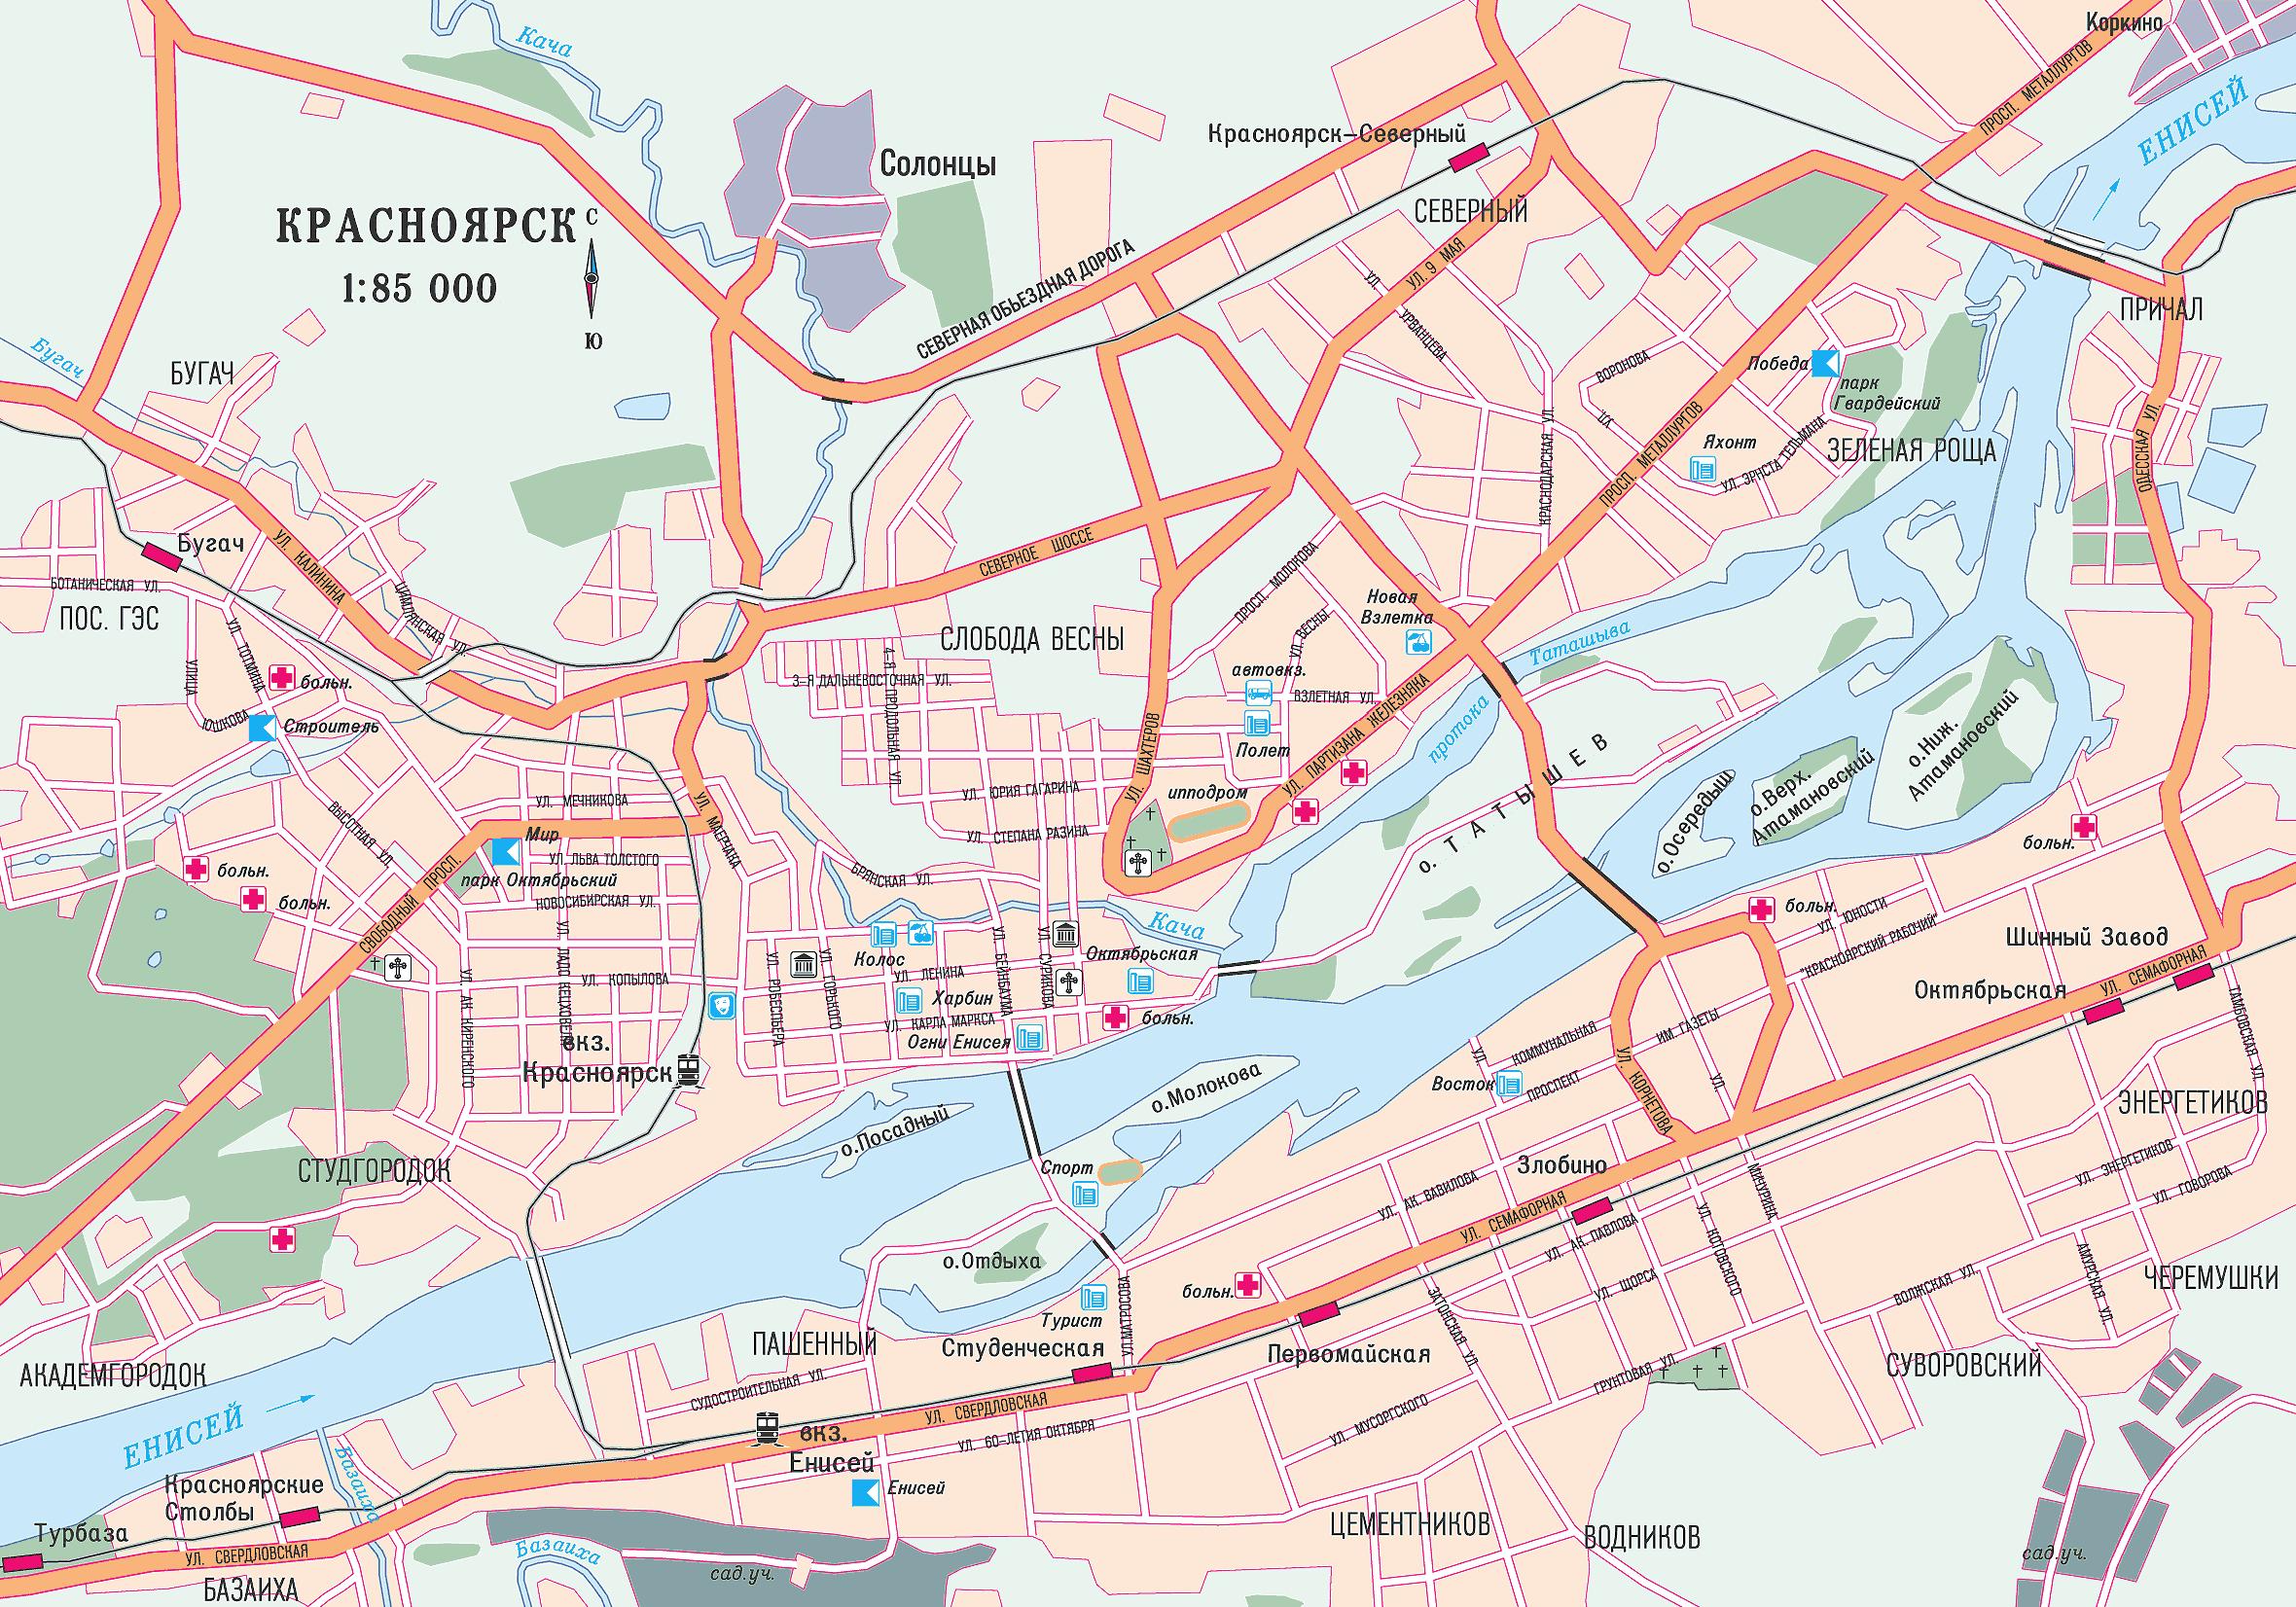 Схема красноярска улиц